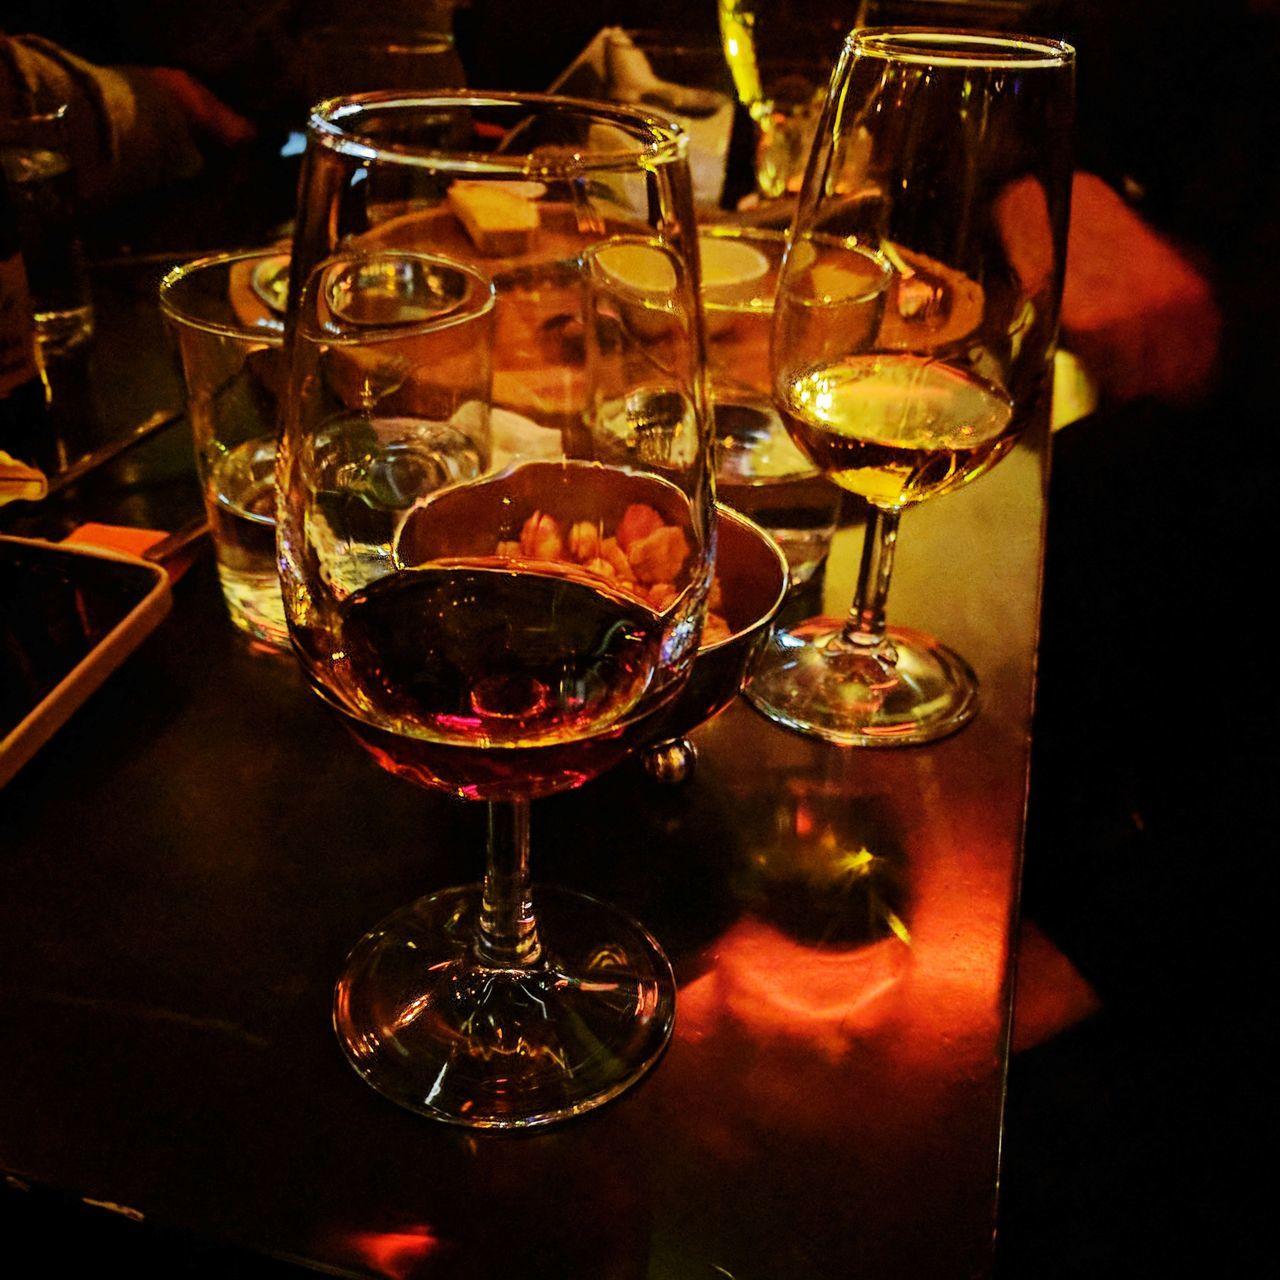 Alcohol Drink Drinking Glass Night Nightlife Hard Liquor Whisky Taste Drinking Burbon Burbonwhiskey Bar Whiskey Hanging Out EyeEmNewHere